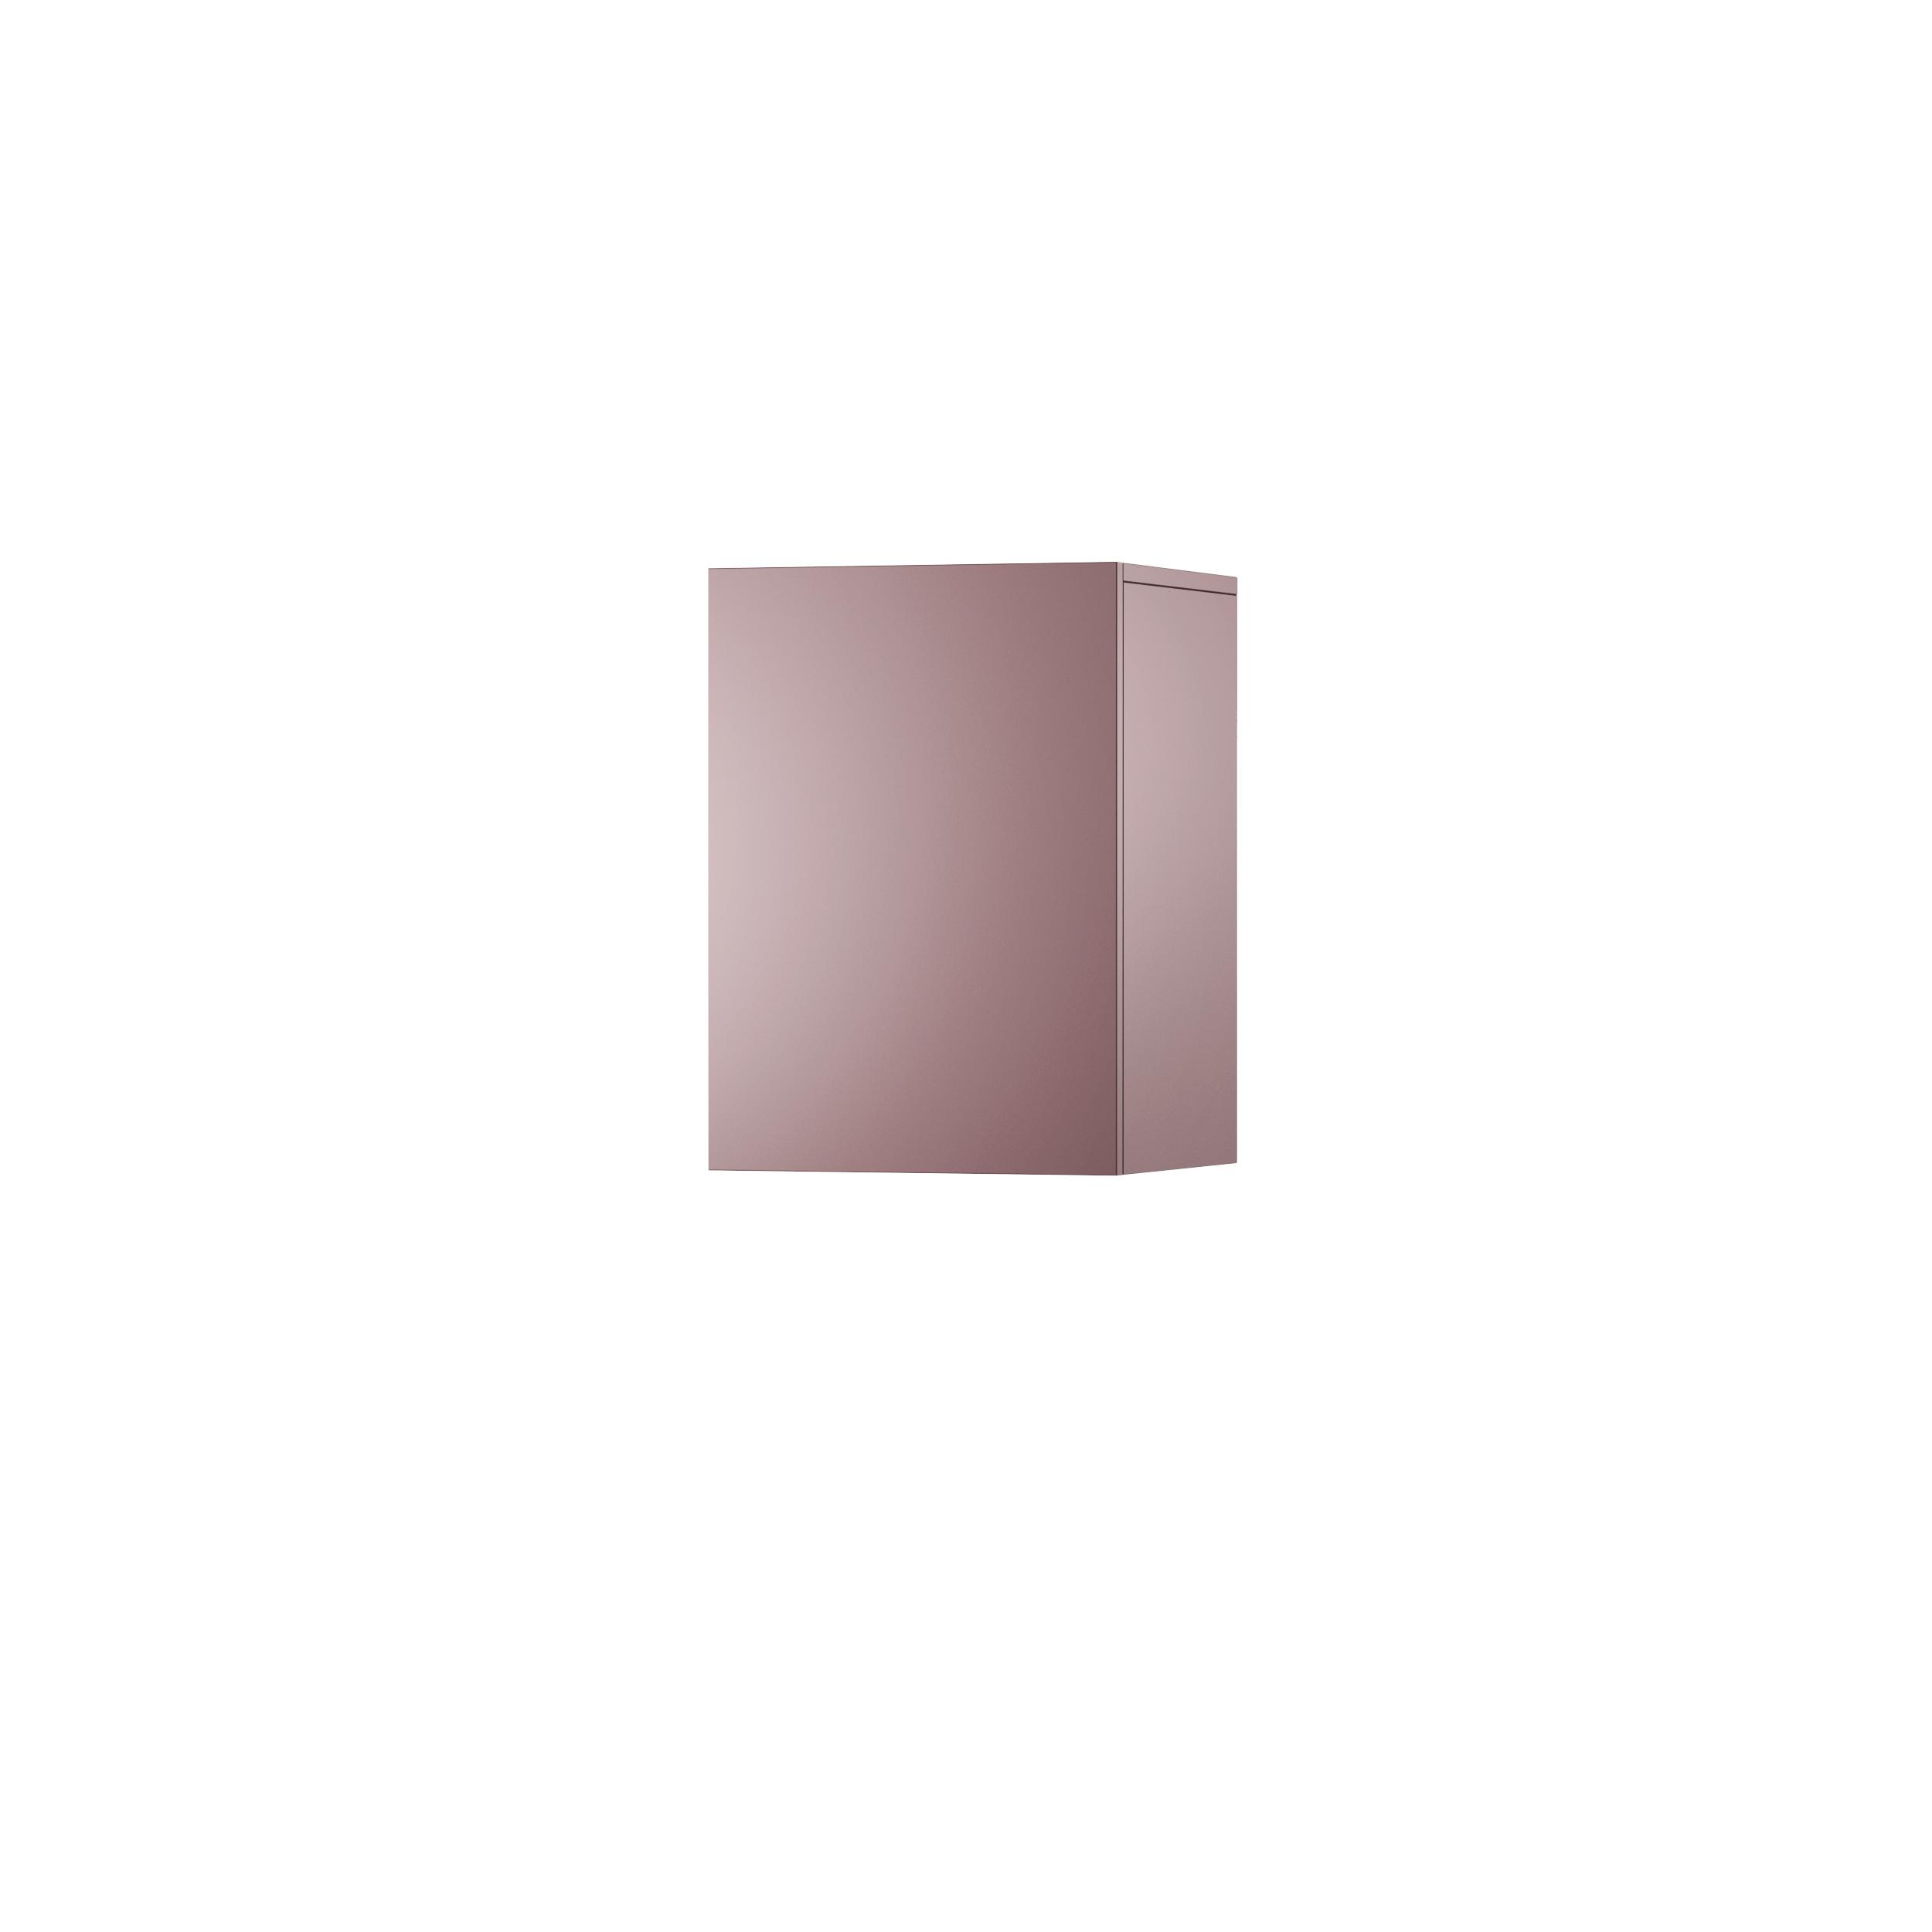 Dulap Modular Nook Narrow Violet  L42xl37xh58 Cm